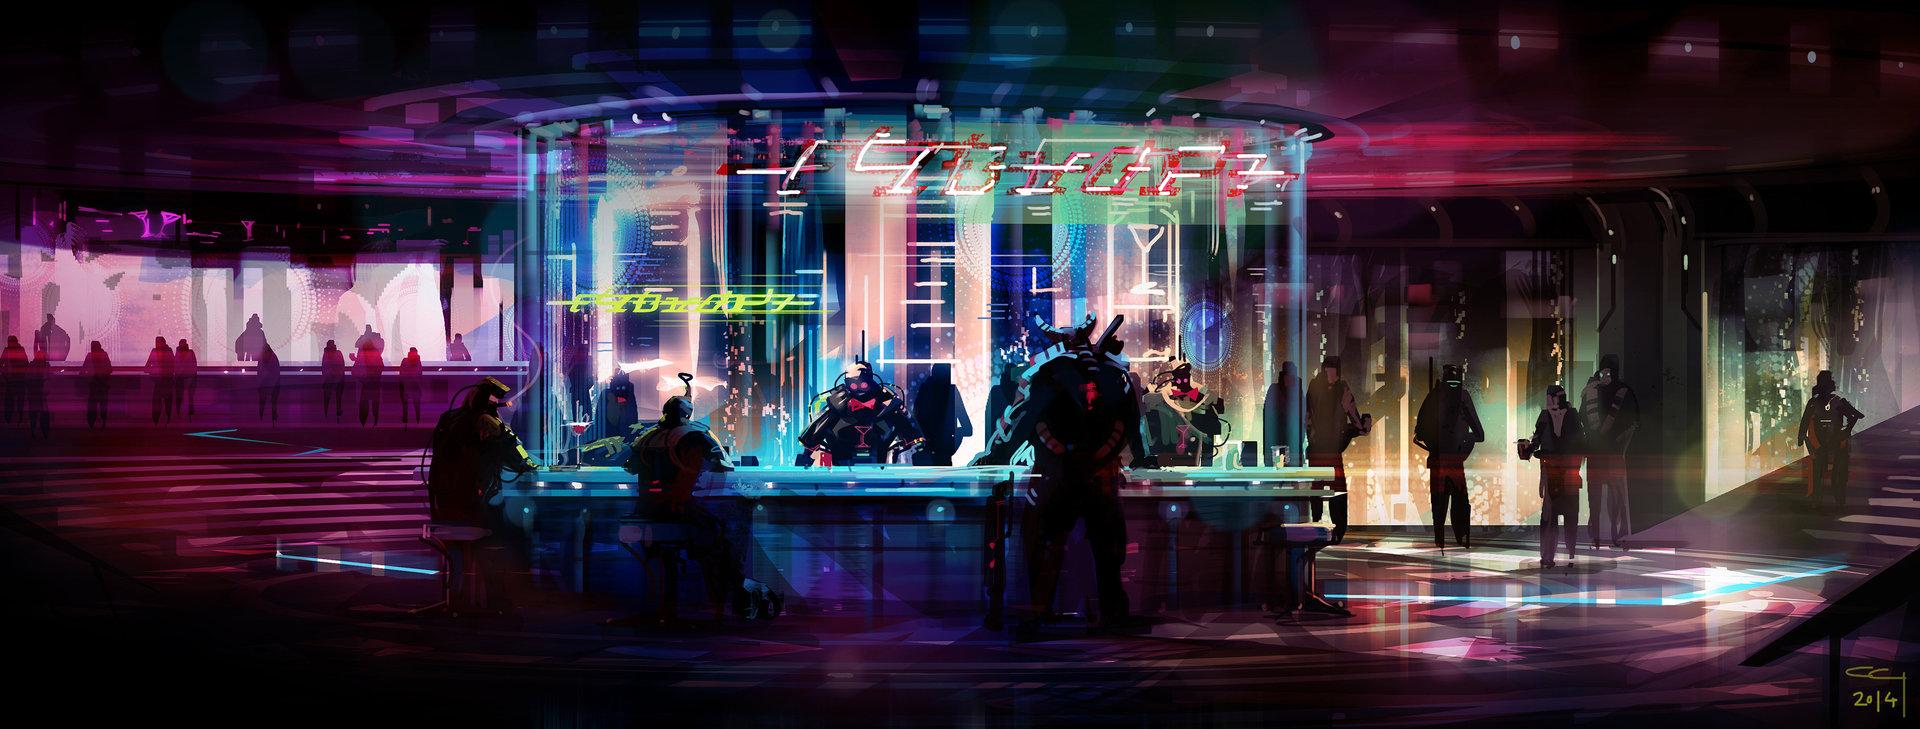 Chris goff scifi bar 30 02